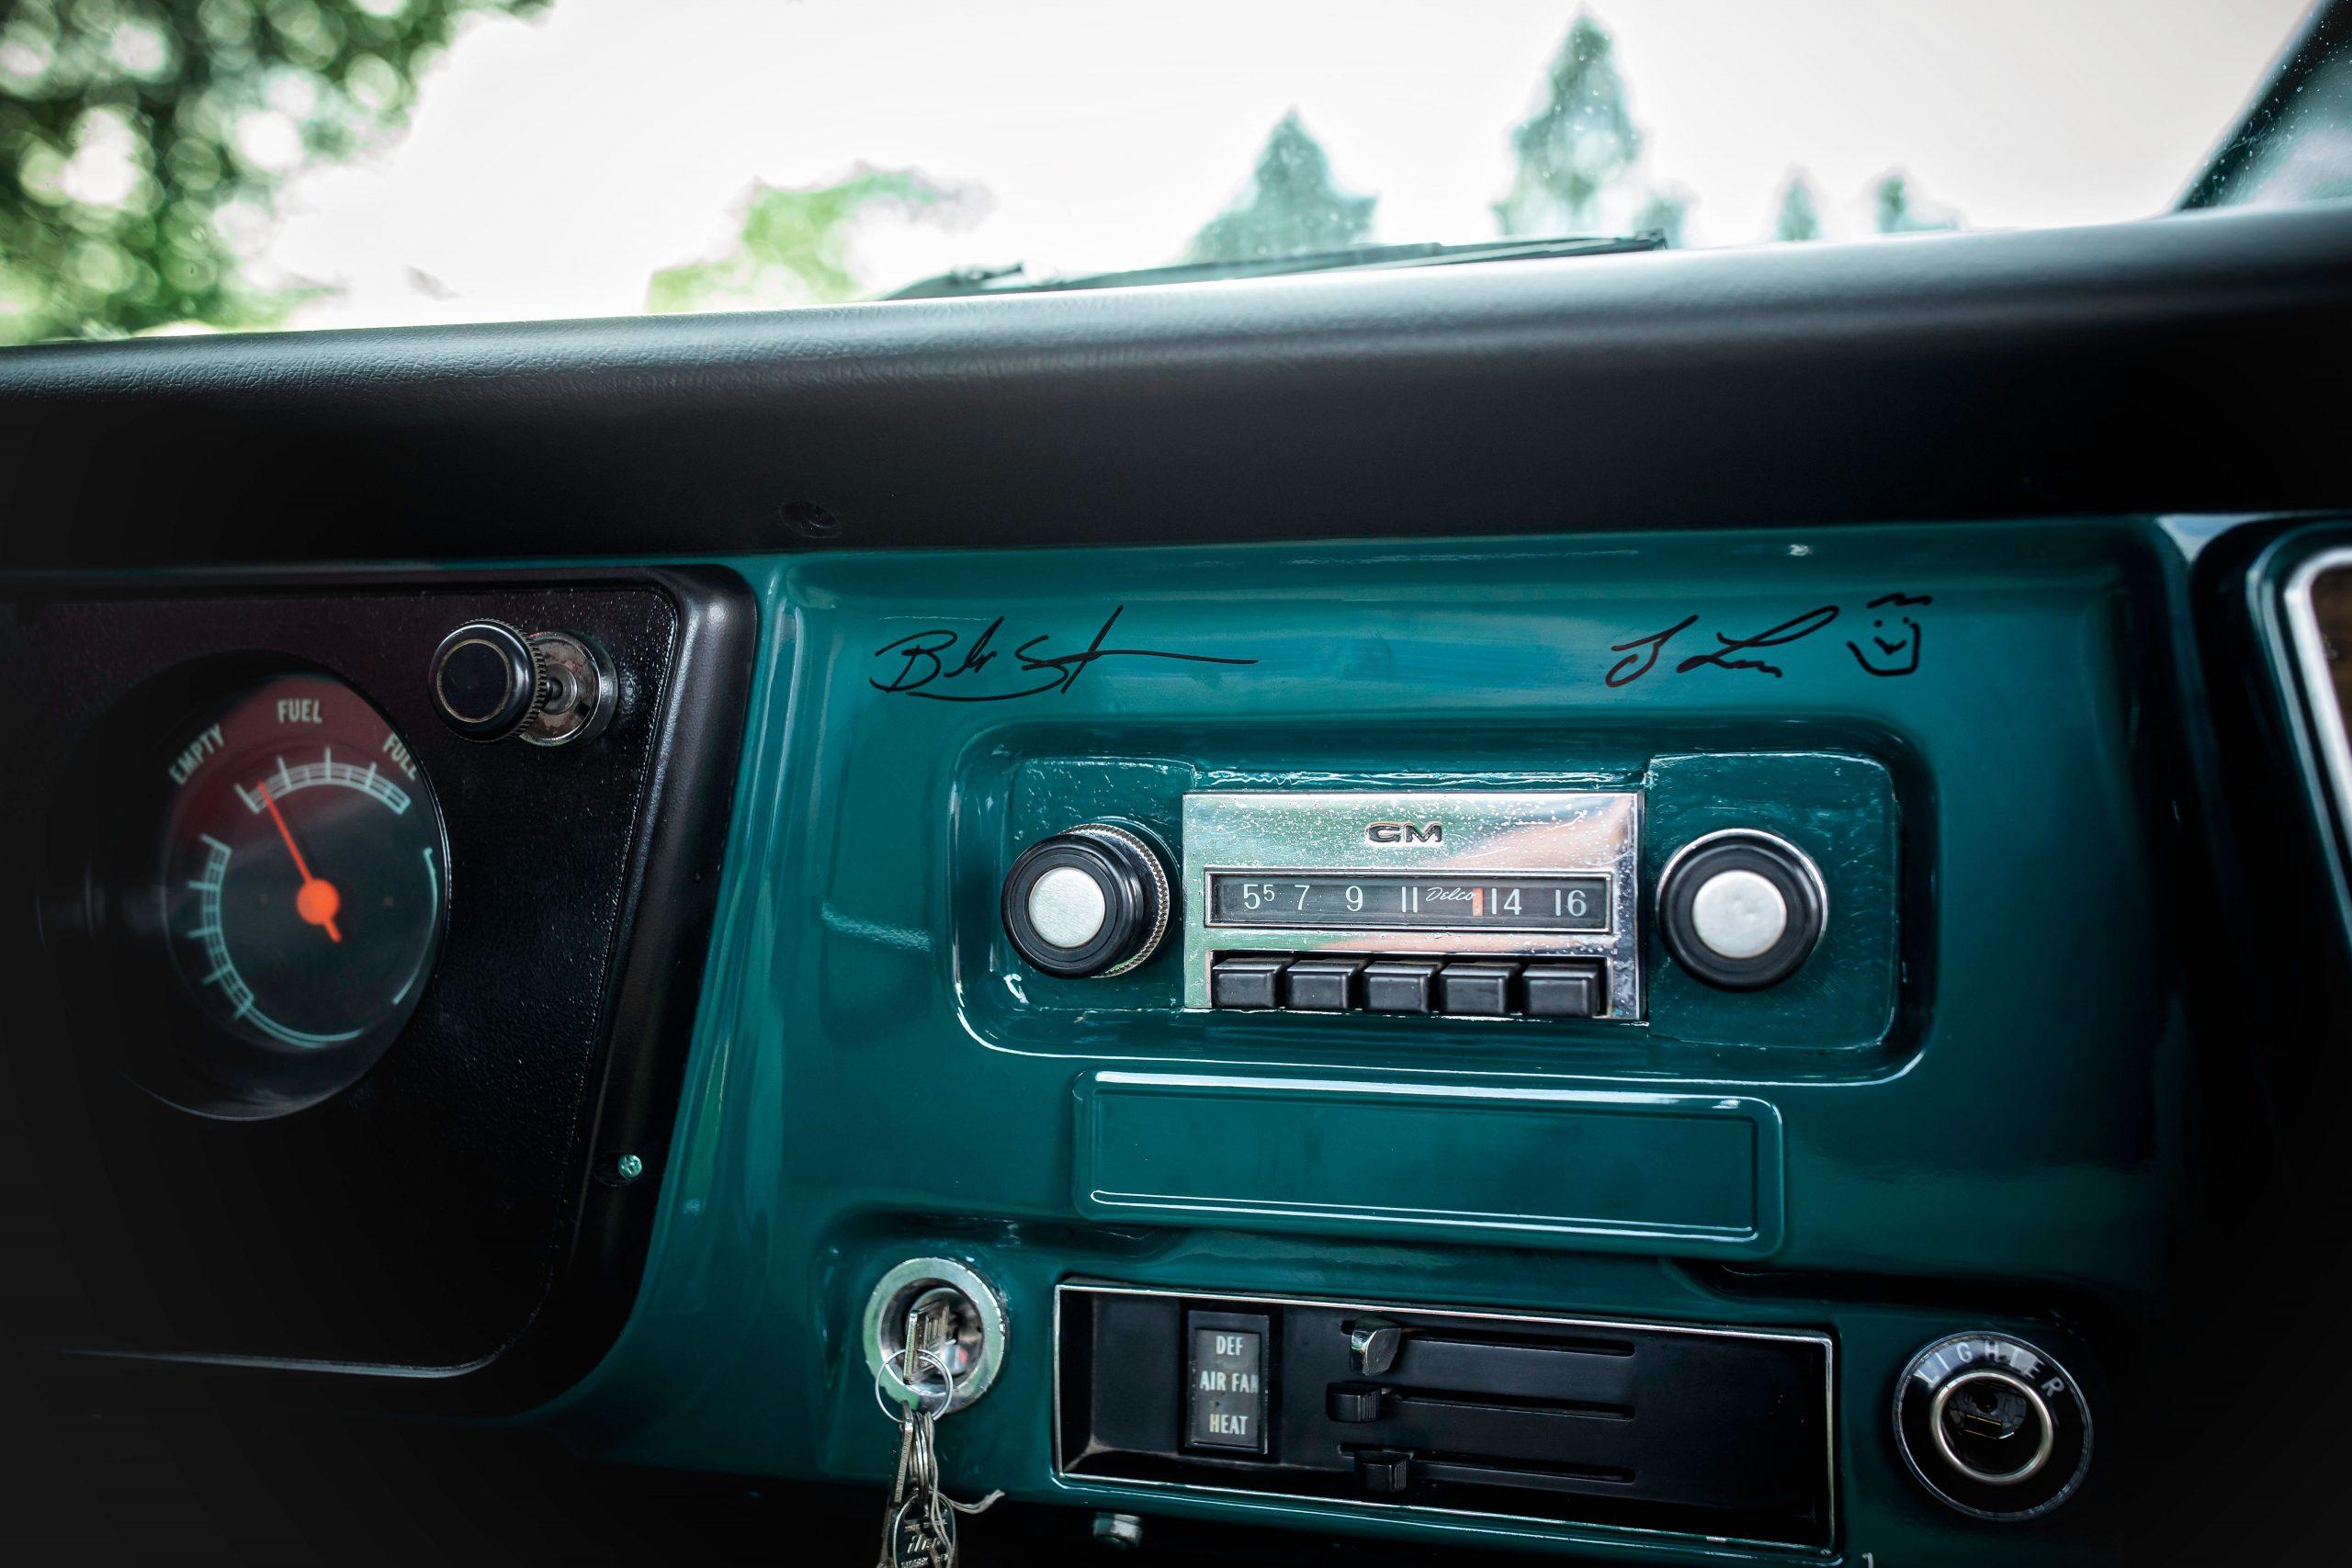 Elvis Presley Owned 1967 GMC Pickup interior dash radio signed